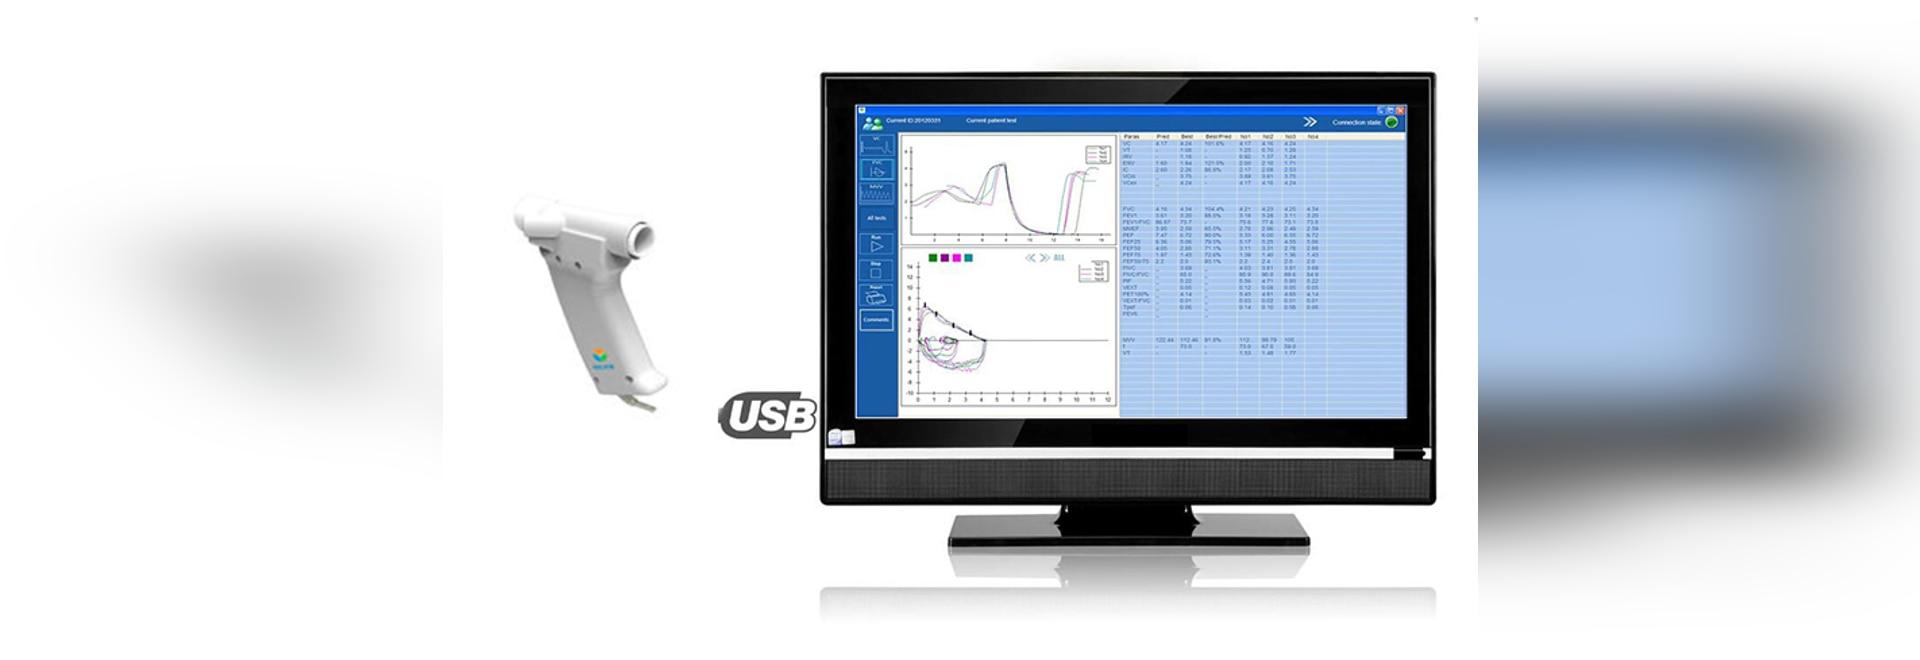 Ultrasonic Hand-held Spirometer Computer Based